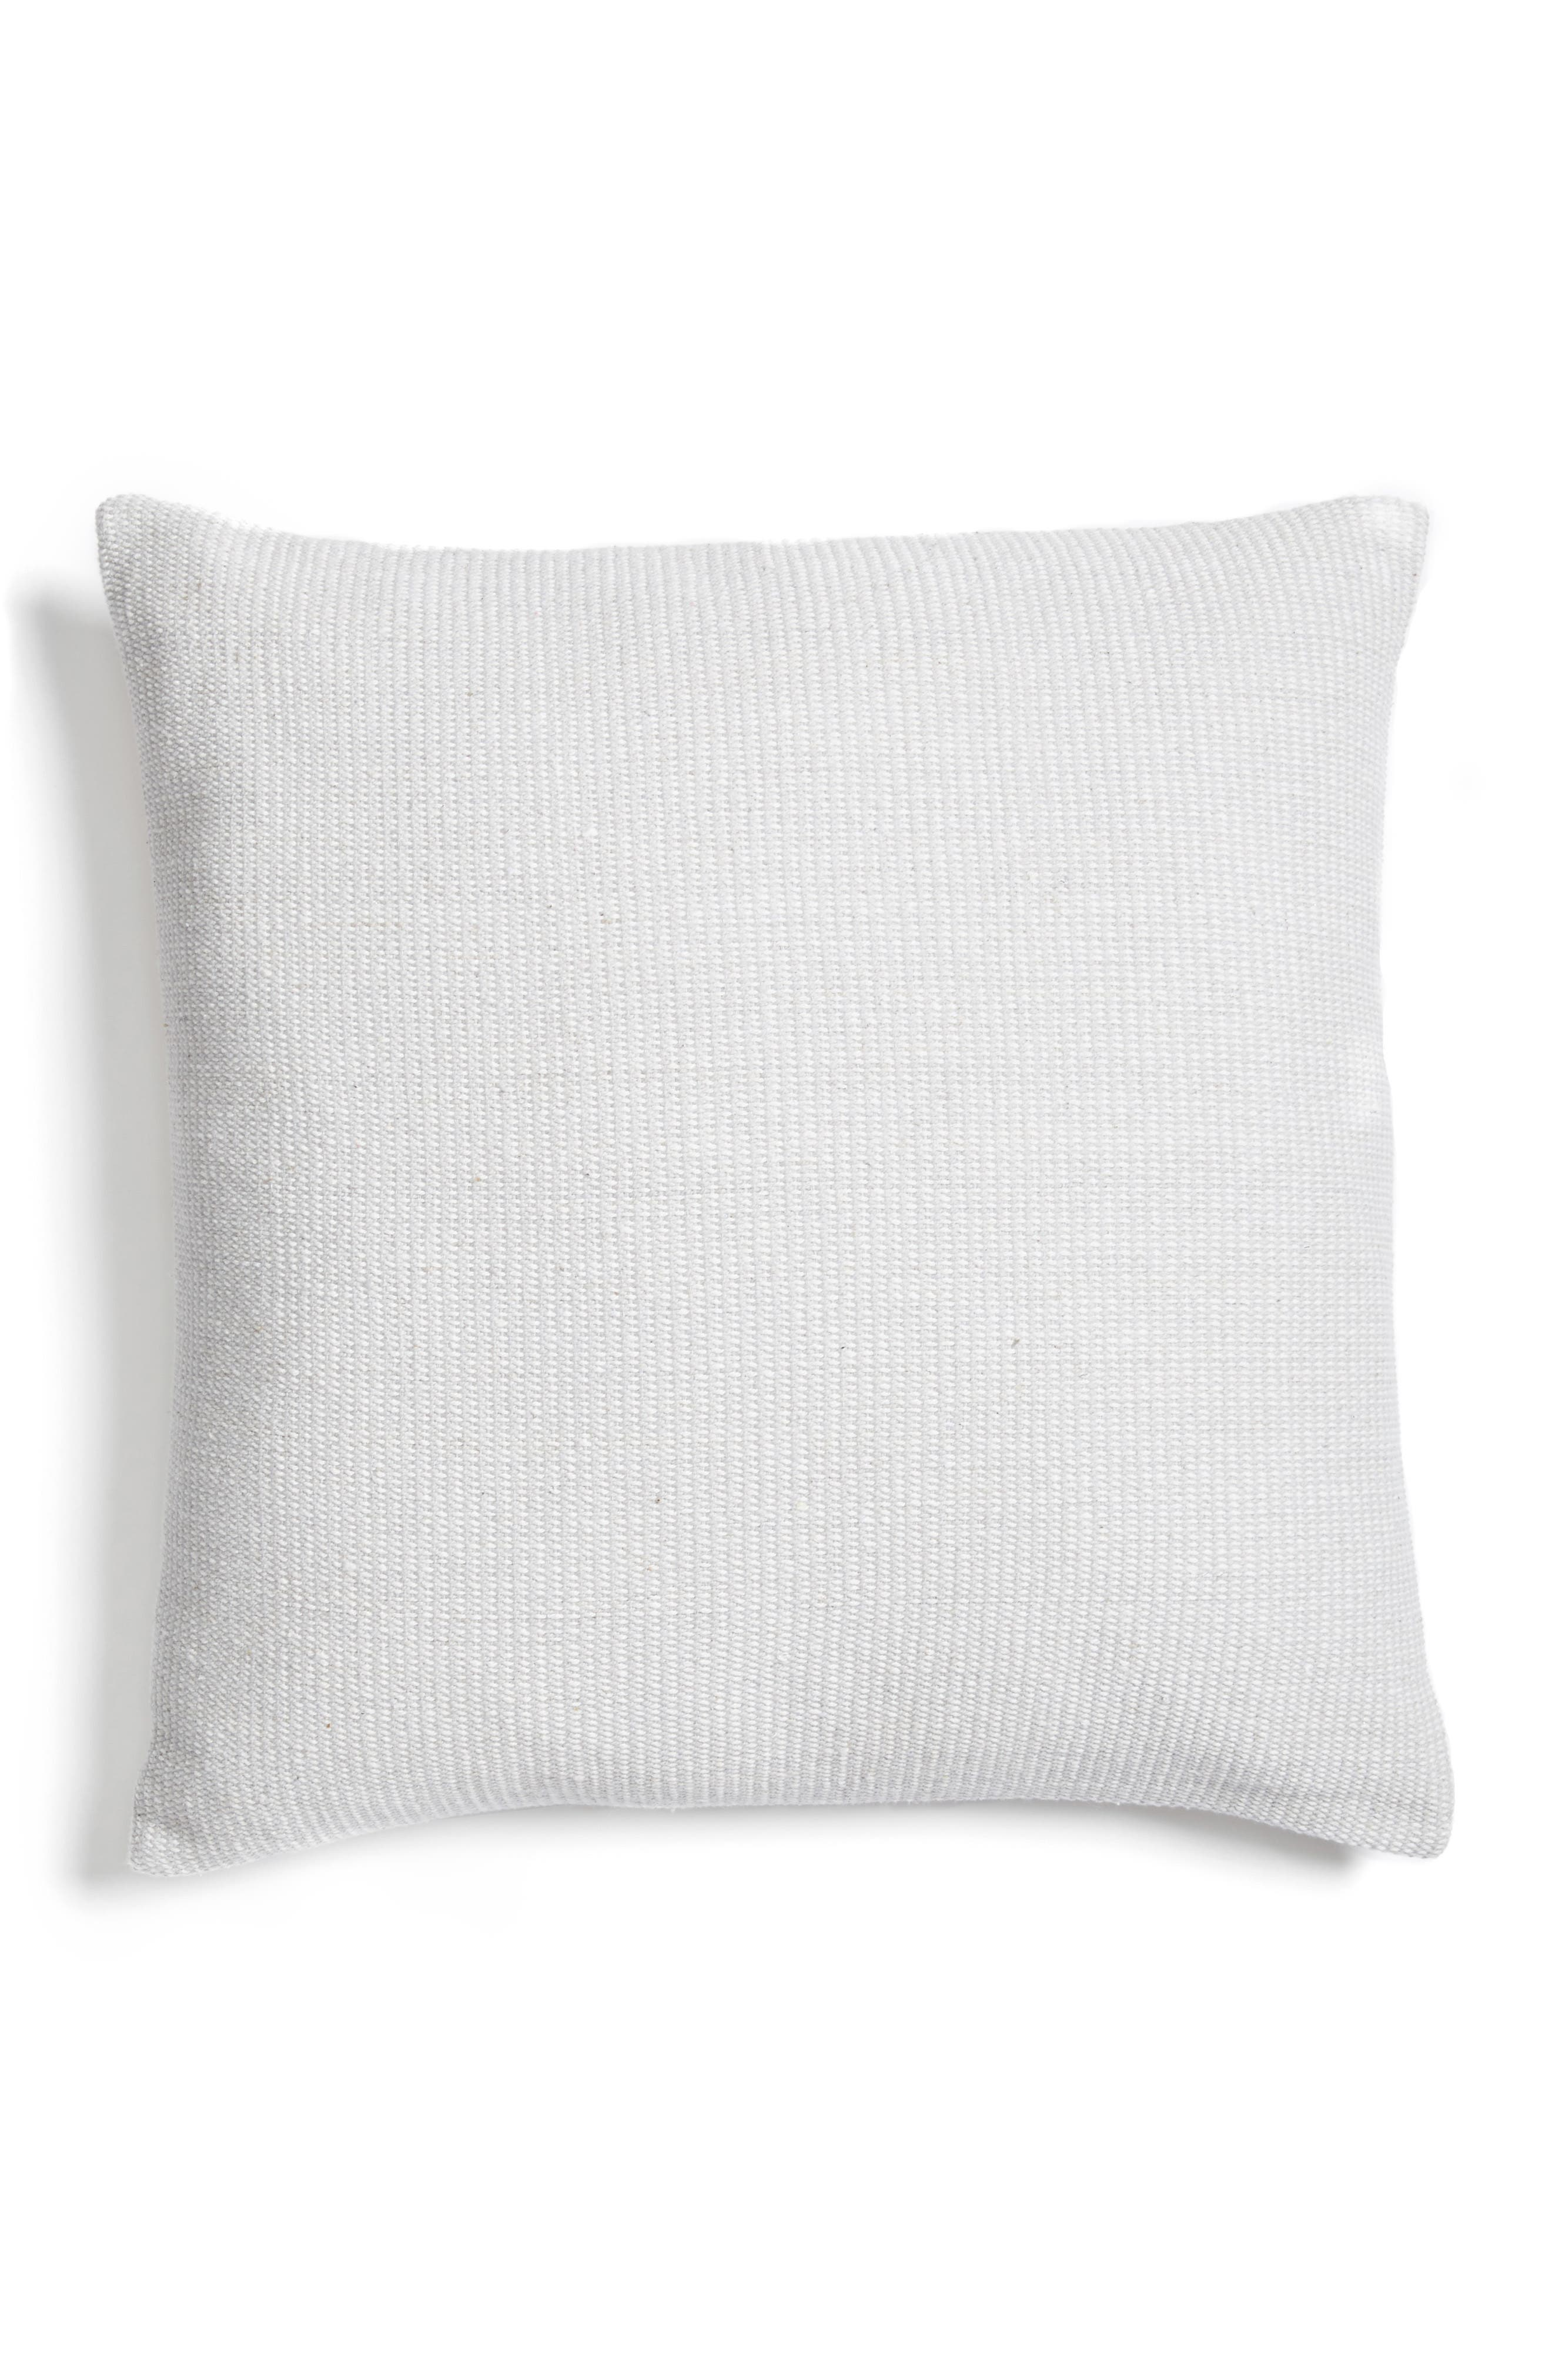 Main Image - Calvin Klein Home Structure Pillow